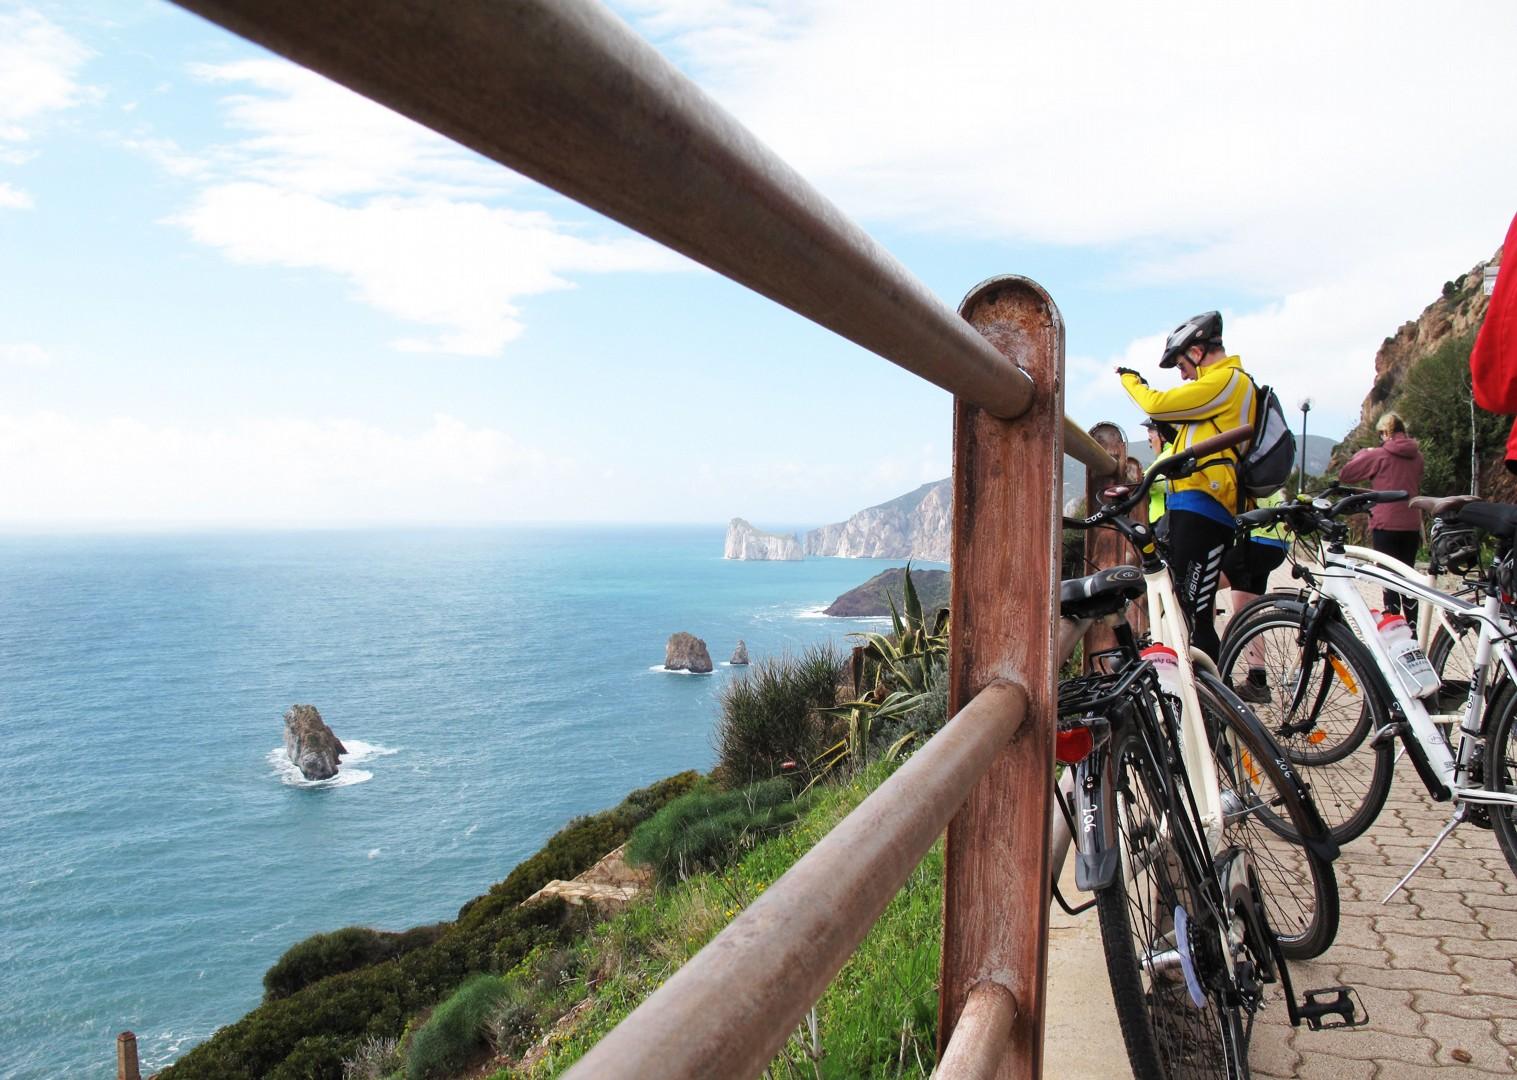 island-cycling-holiday-italy-sardinia-coast.jpg - Italy - Sardinia - Island Flavours - Self-Guided Leisure Cycling Holiday - Italia Leisure and Family Cycling